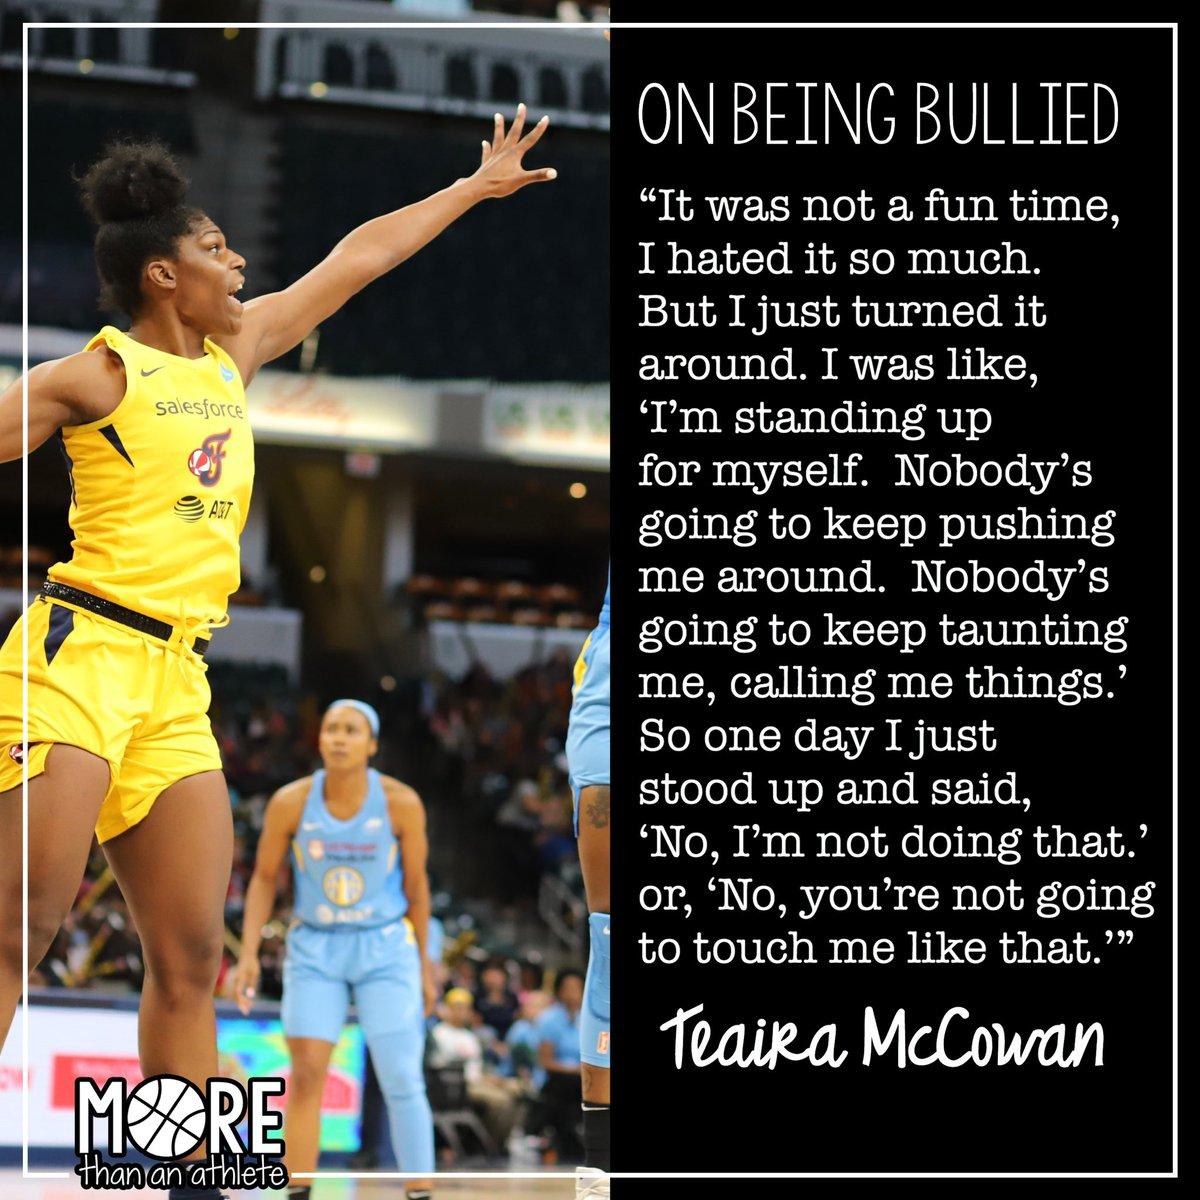 "6'7"" center Teaira McCowan (@Teaira_15), recent Mississippi State grad and WNBA draft pick #3, on being bullied when she was younger. . #wnba #teairamccowan #hailstatewbk #indianafever #fever20 #morethananathlete"